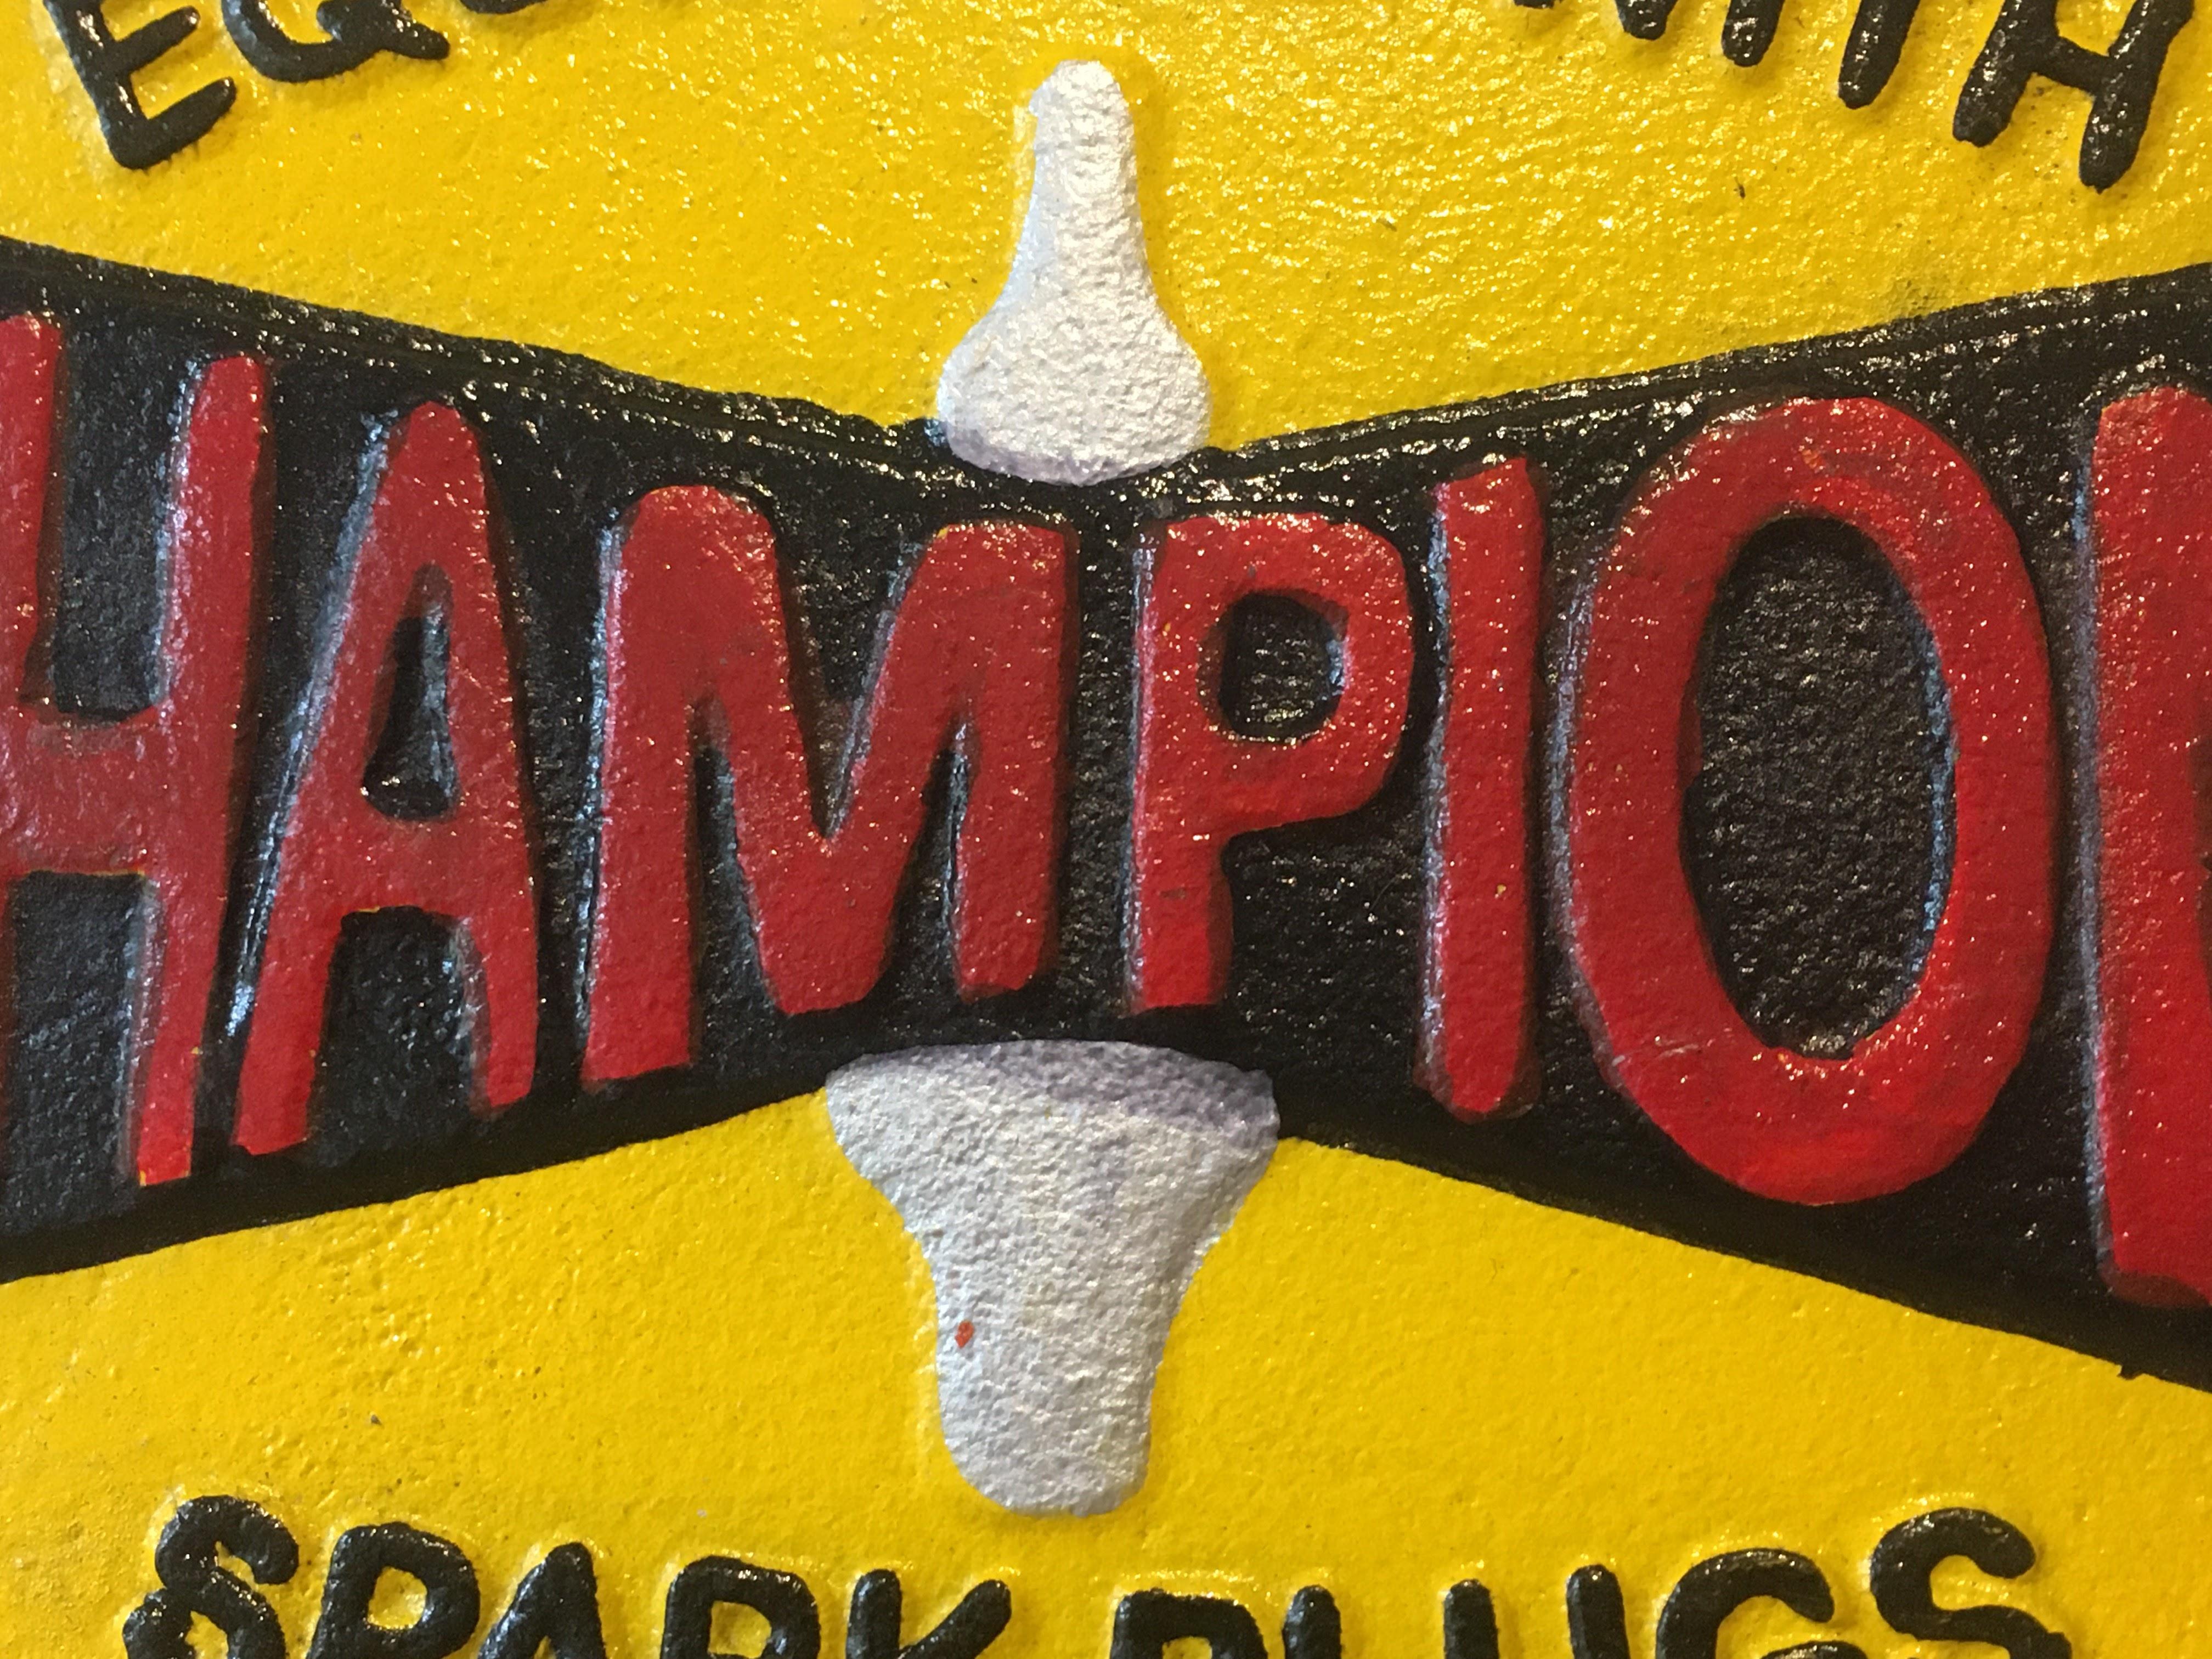 Champion 'Spark Plugs' Cast Iron Sign - Image 5 of 6